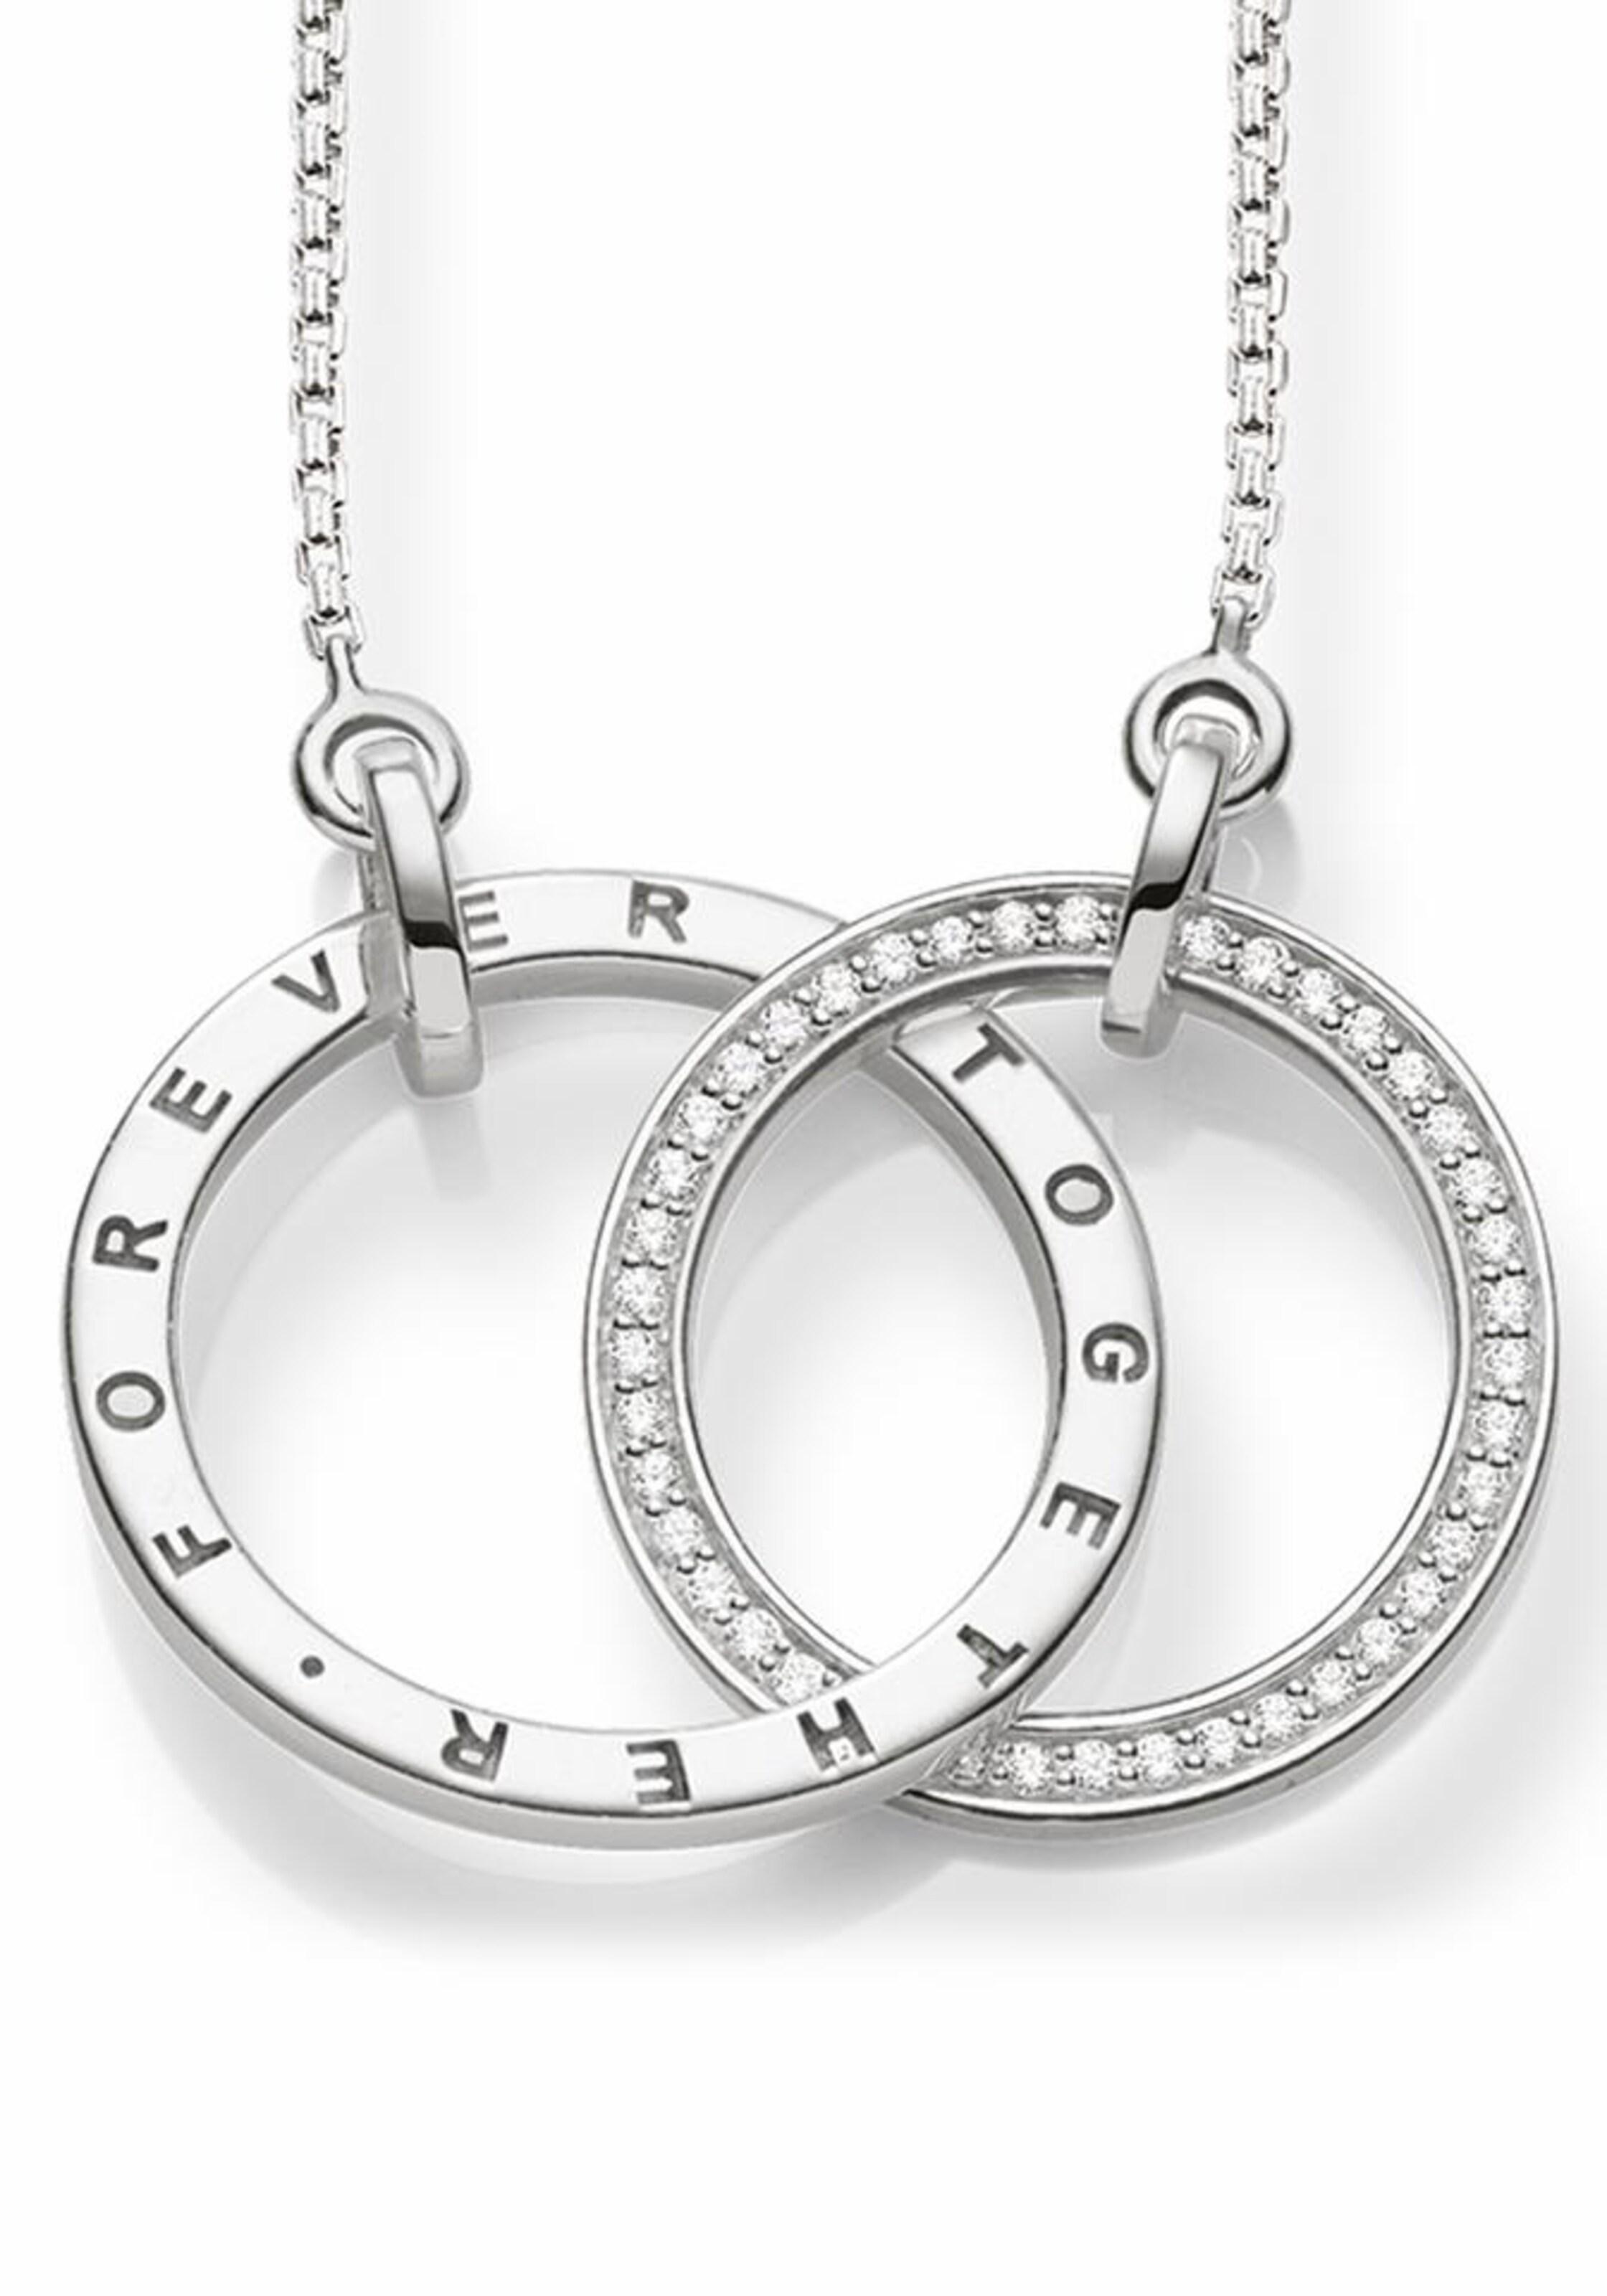 Thomas Sabo Silberkette Zu Verkaufen ag2O7Wq0